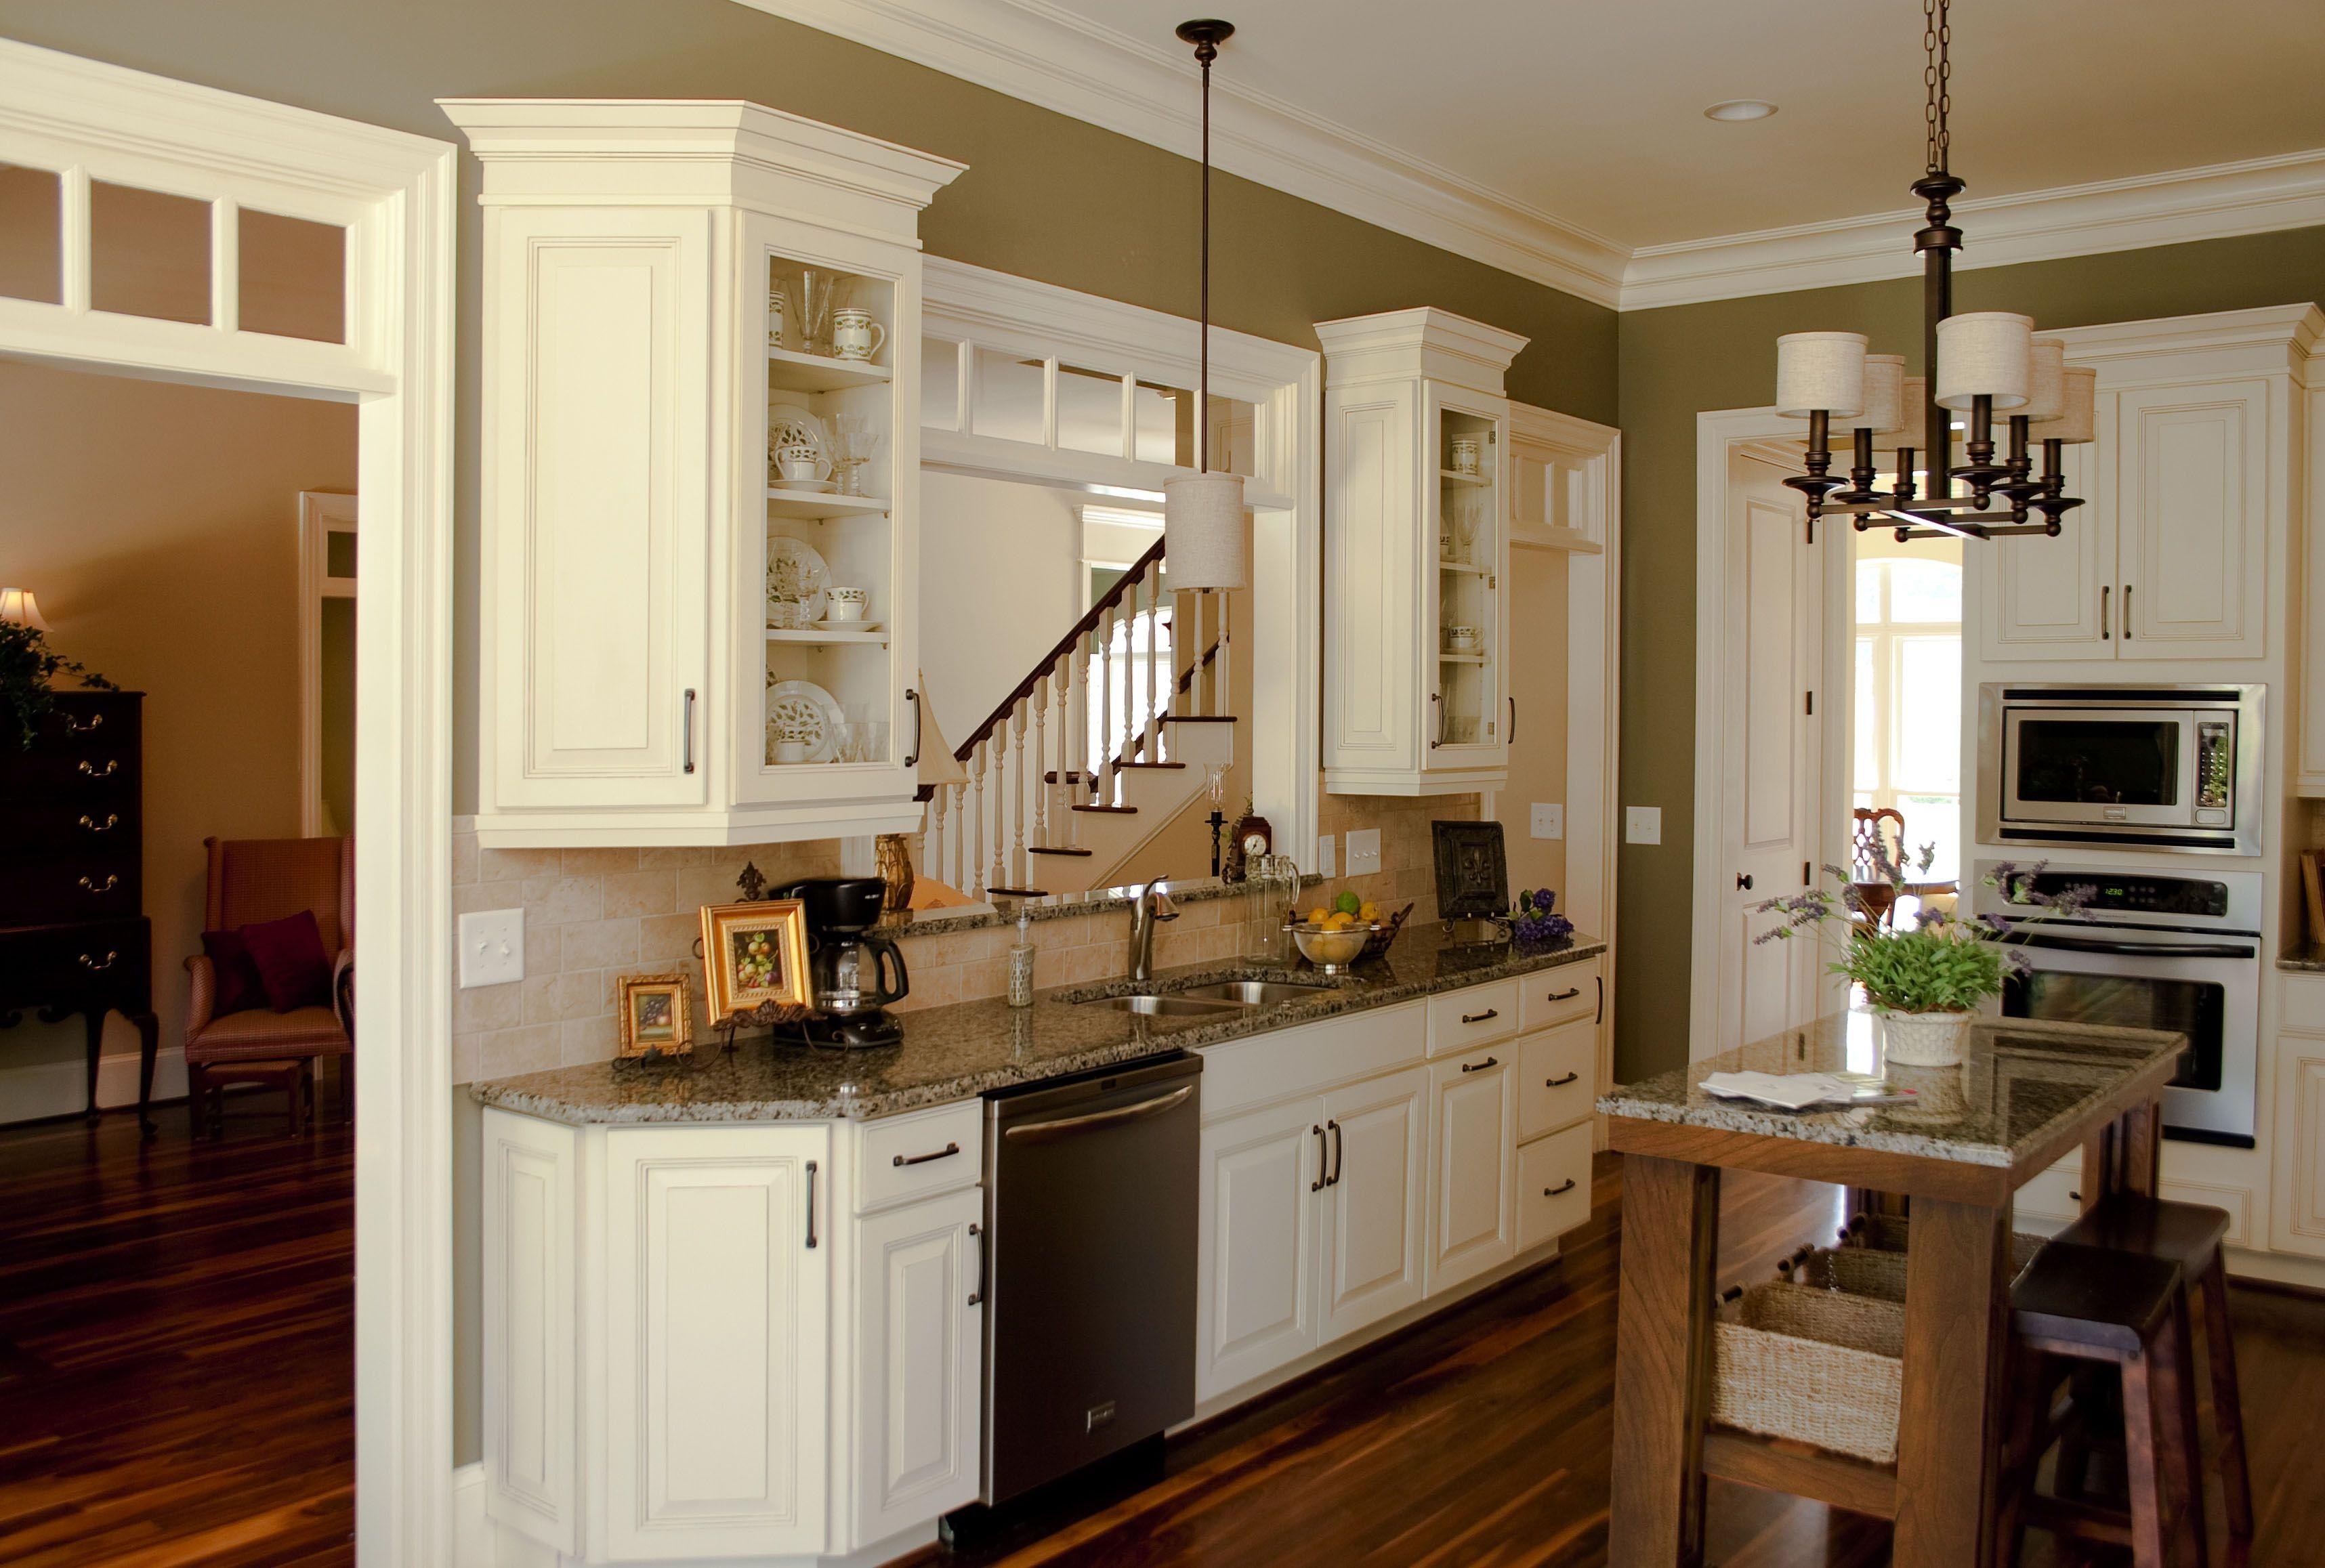 18 Inch Deep Kitchen Wall Cabinets Kitchen Cabinets